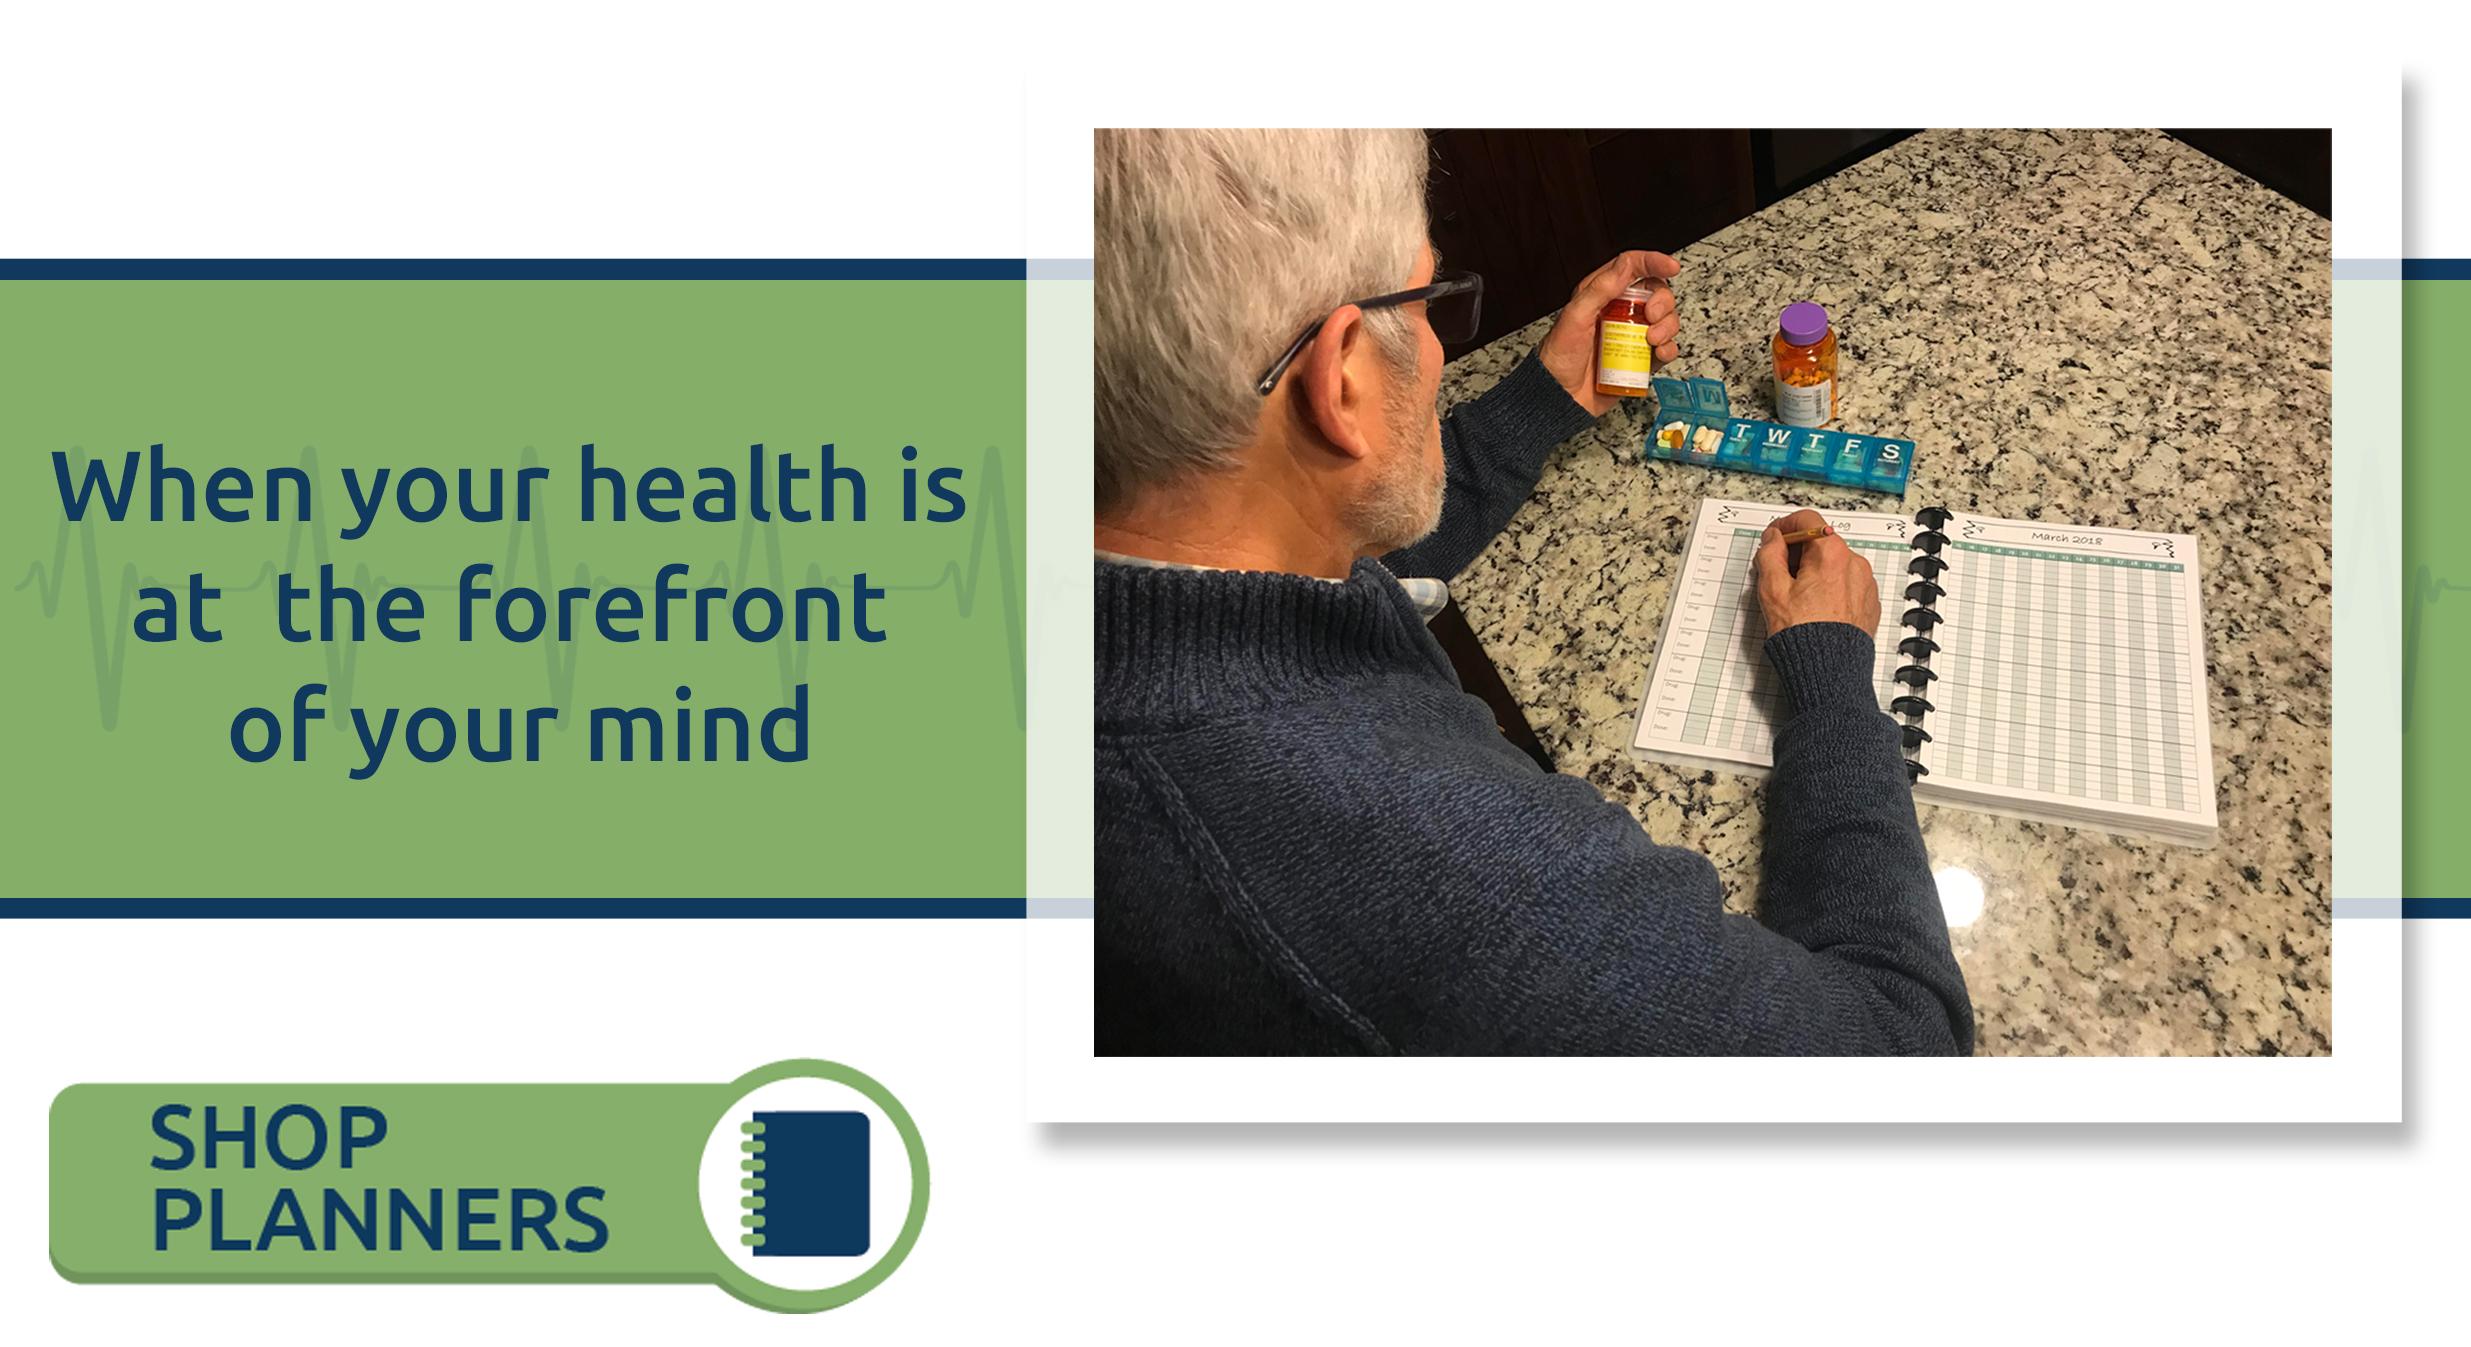 Health Care Planner